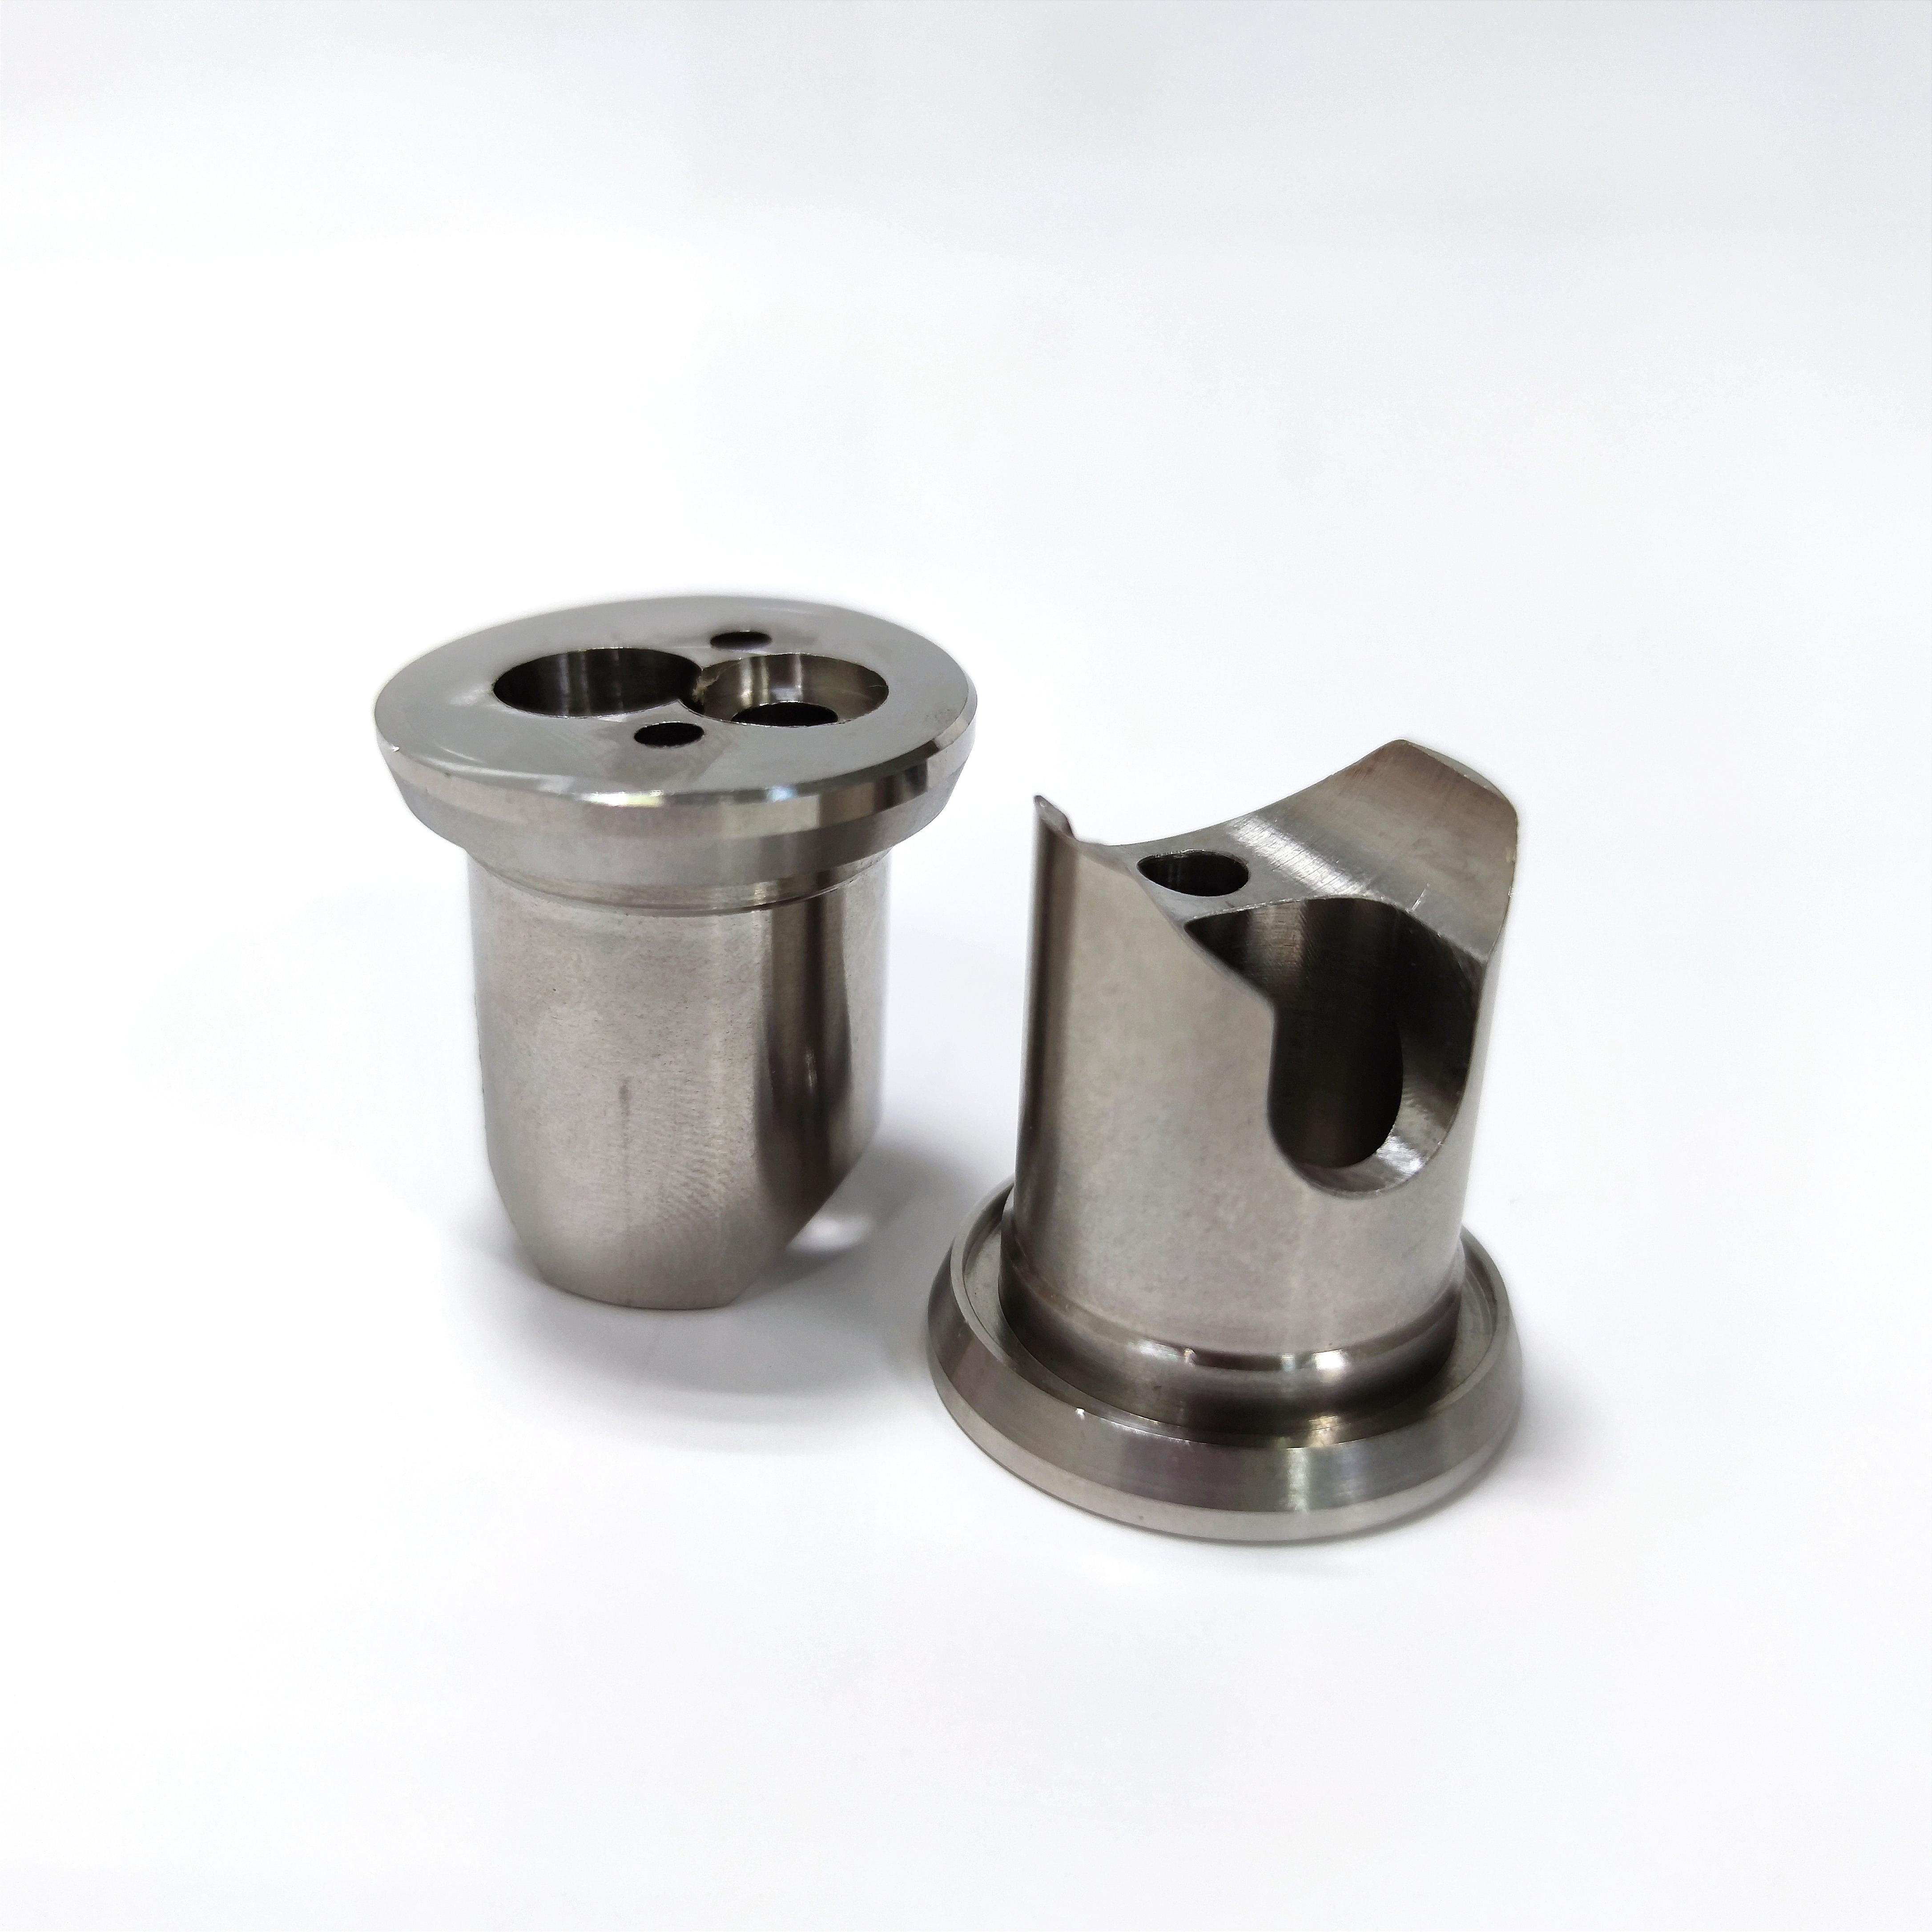 OEM CNC Aluminum Machining Electronics Parts Precision CNC Machined Aluminum Housing Parts with Metal CNC Services